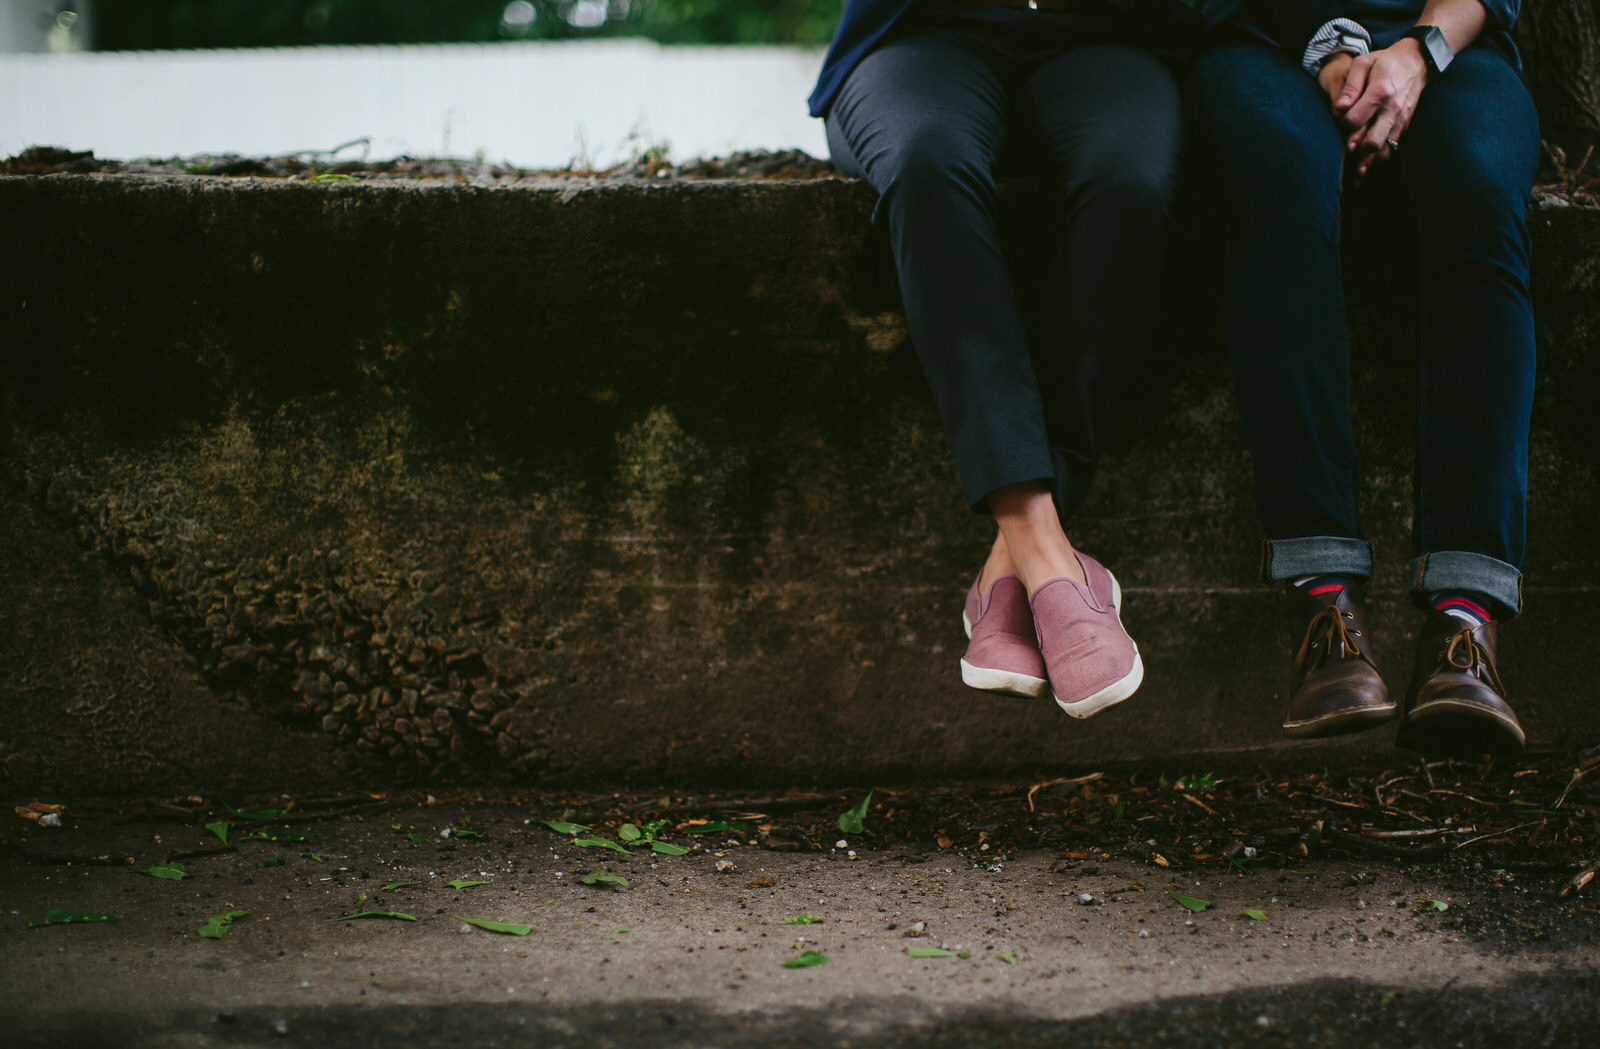 feet-glbtq-wedding-photographer-love-is-love-destination-tiny-house-photo.jpg